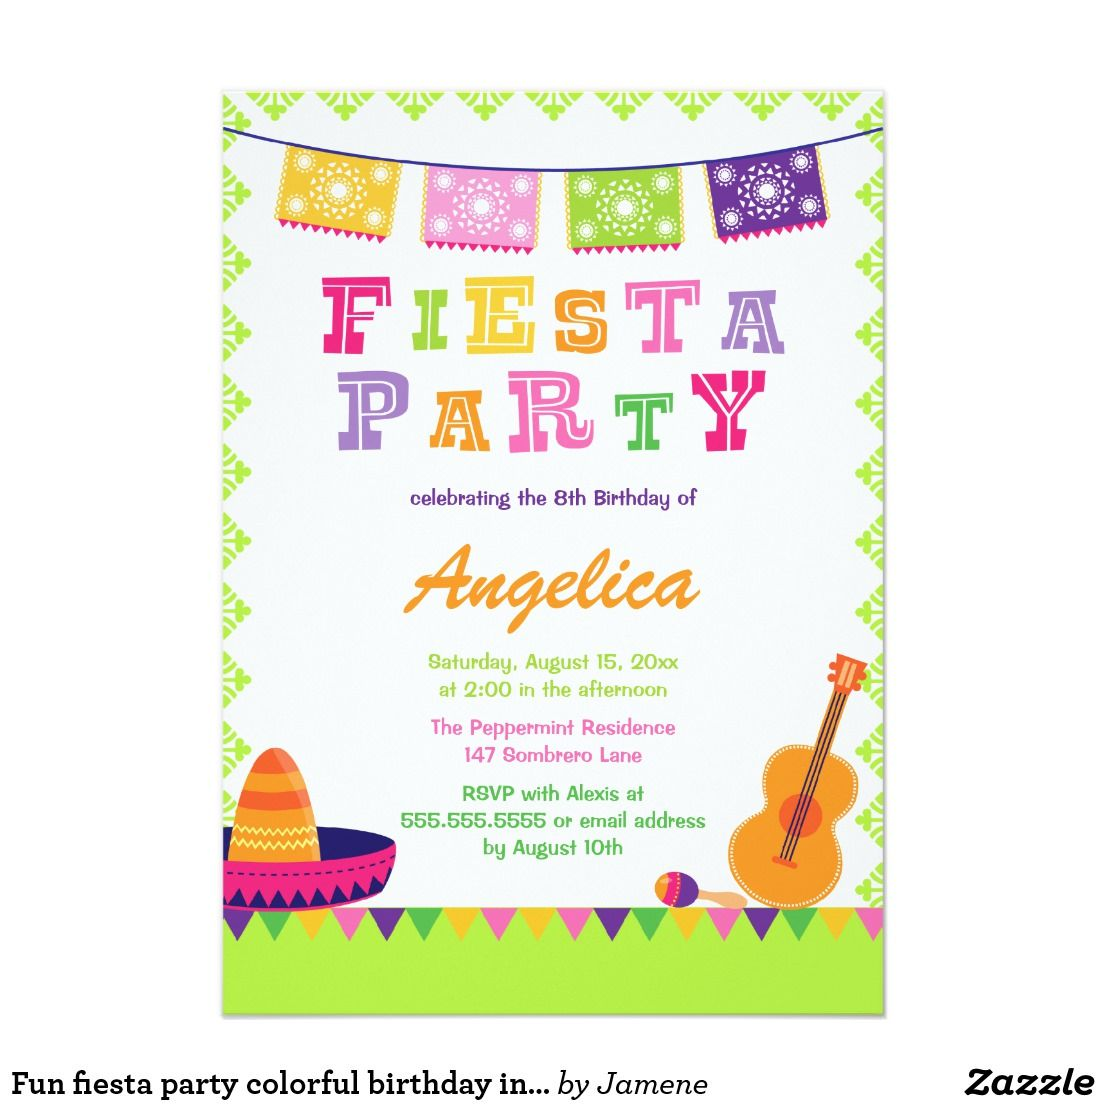 Fun fiesta party colorful birthday invitation   Aislynn Birthday ...